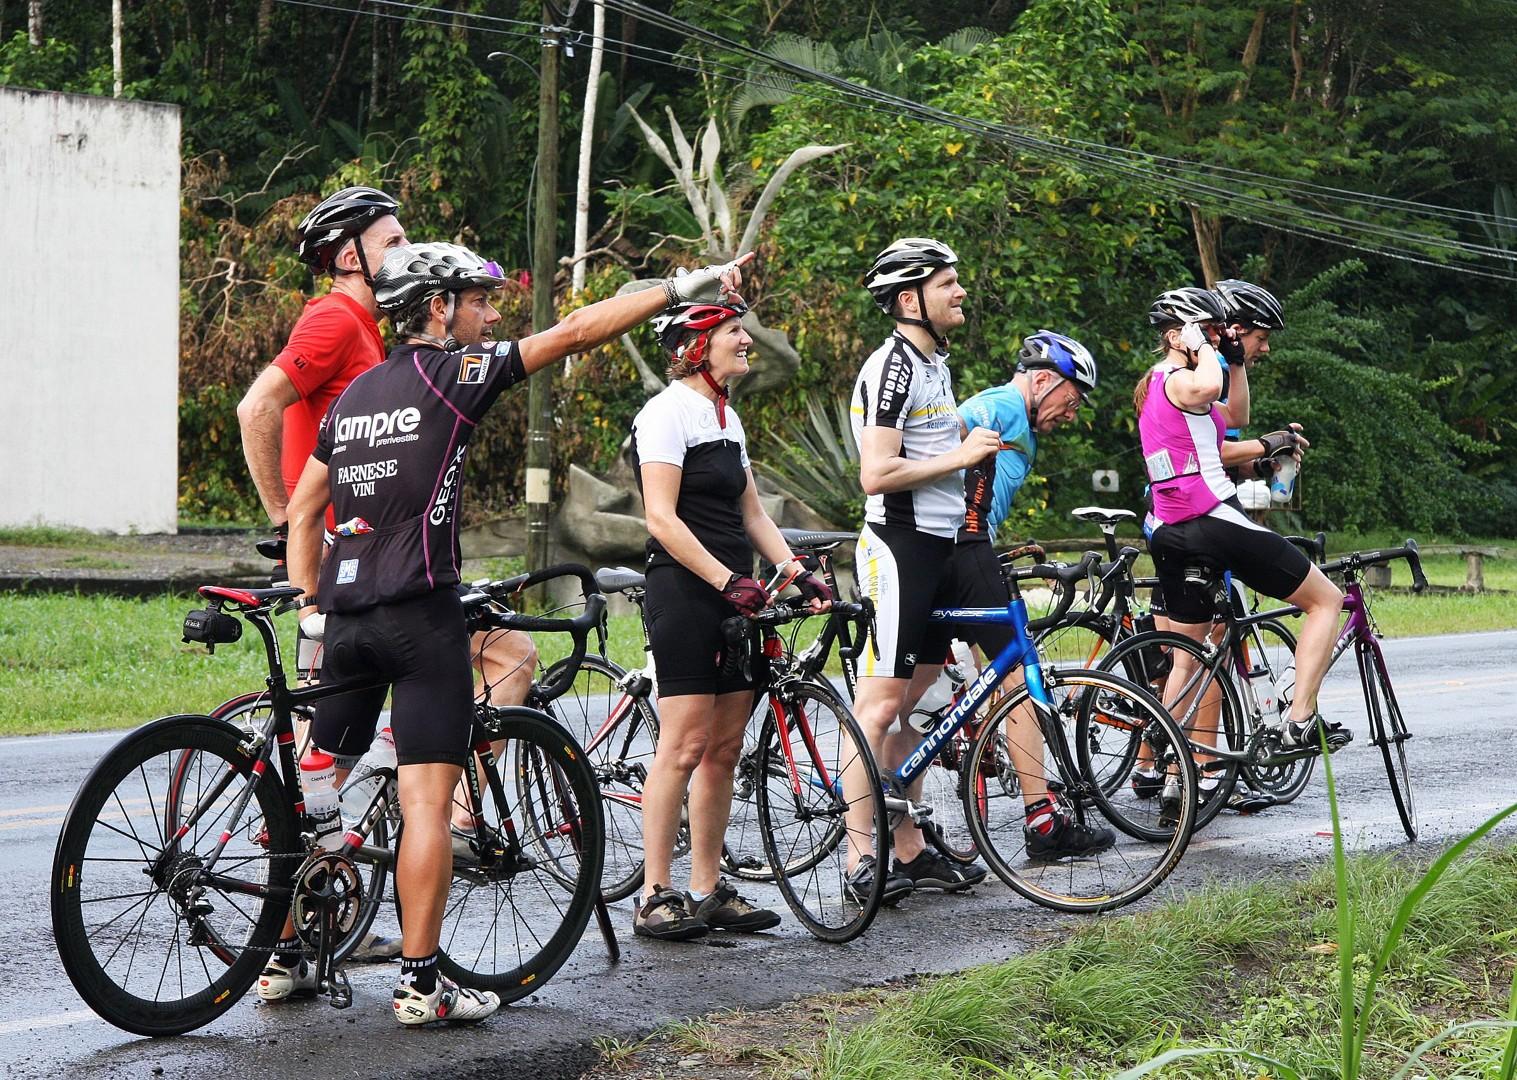 saddle-skedaddle-guided-road-cycling-holiday-ruta-de-los-volcanes-costa-rica.jpg - Costa Rica - Ruta de los Volcanes - Road Cycling